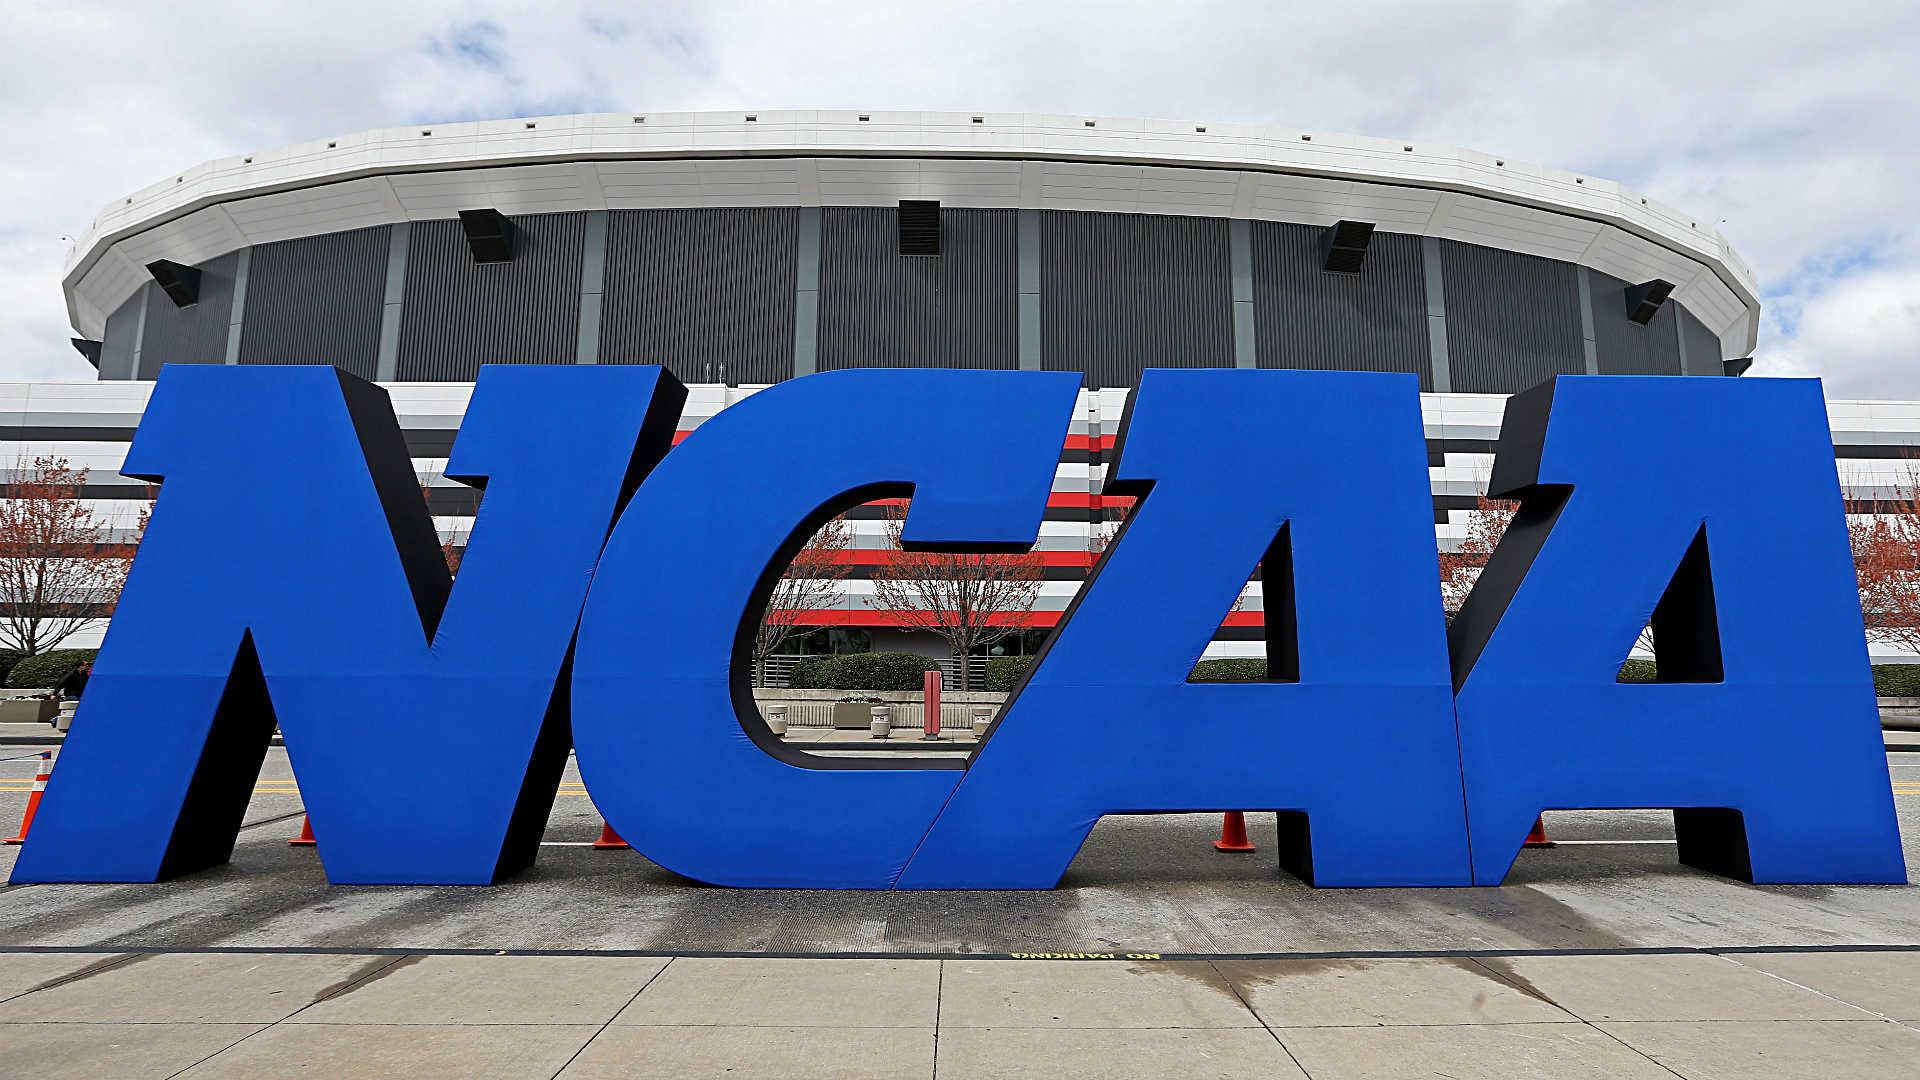 NCAA won't budge on its NIL timeline, despite Gov. Newsom's posturing